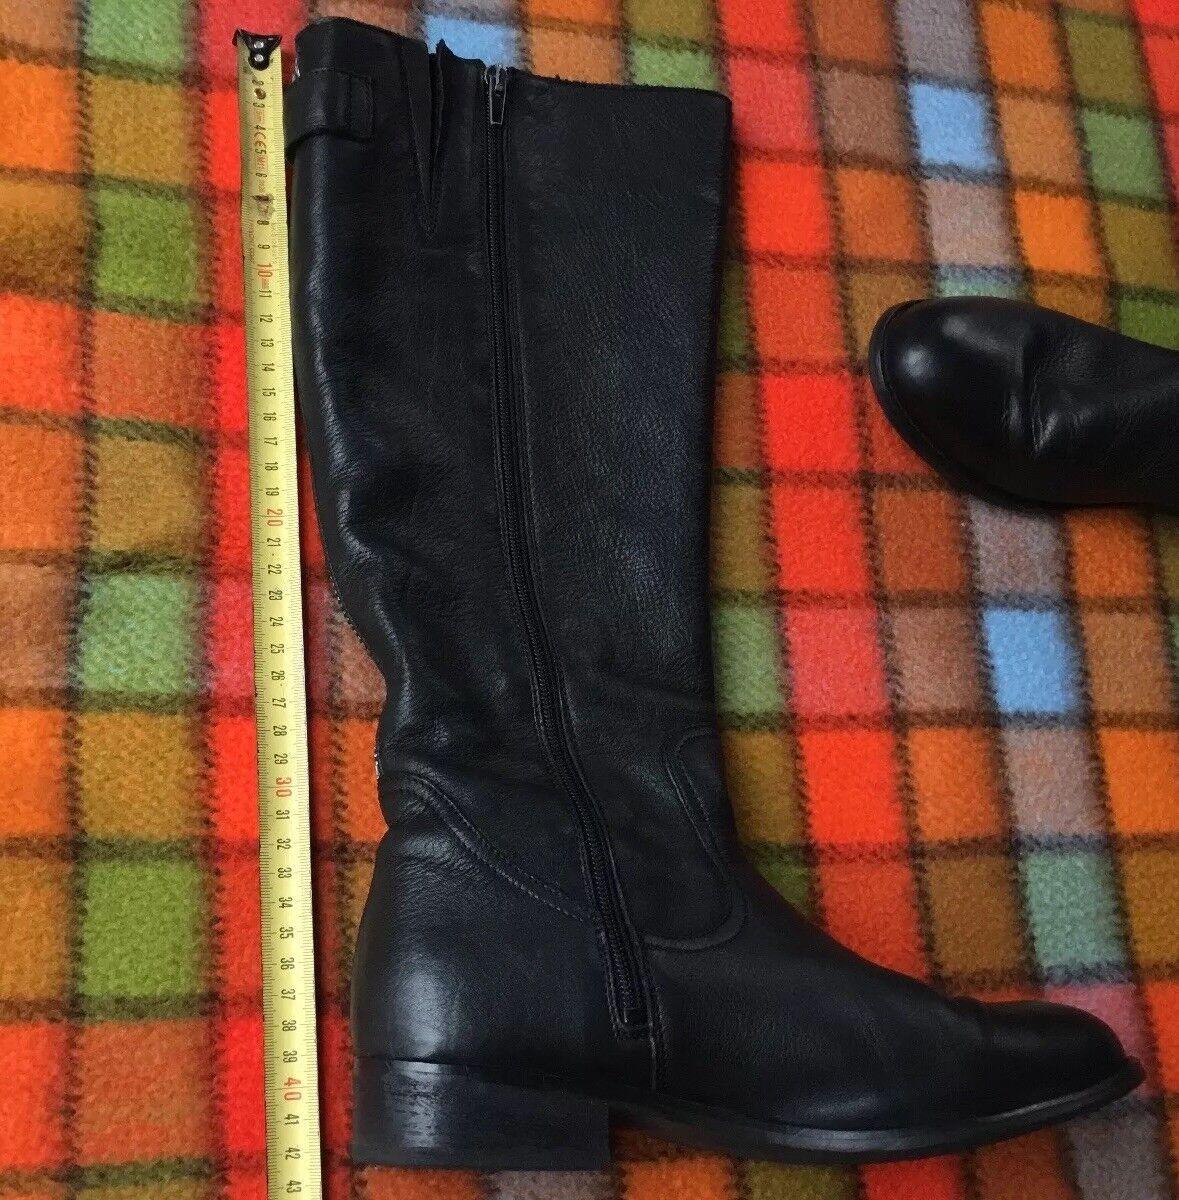 Görts schuhe 39 Damen Stiefel Schwarz Schwarz Schwarz Top Leder Top Zustand NP 179   2d1e00